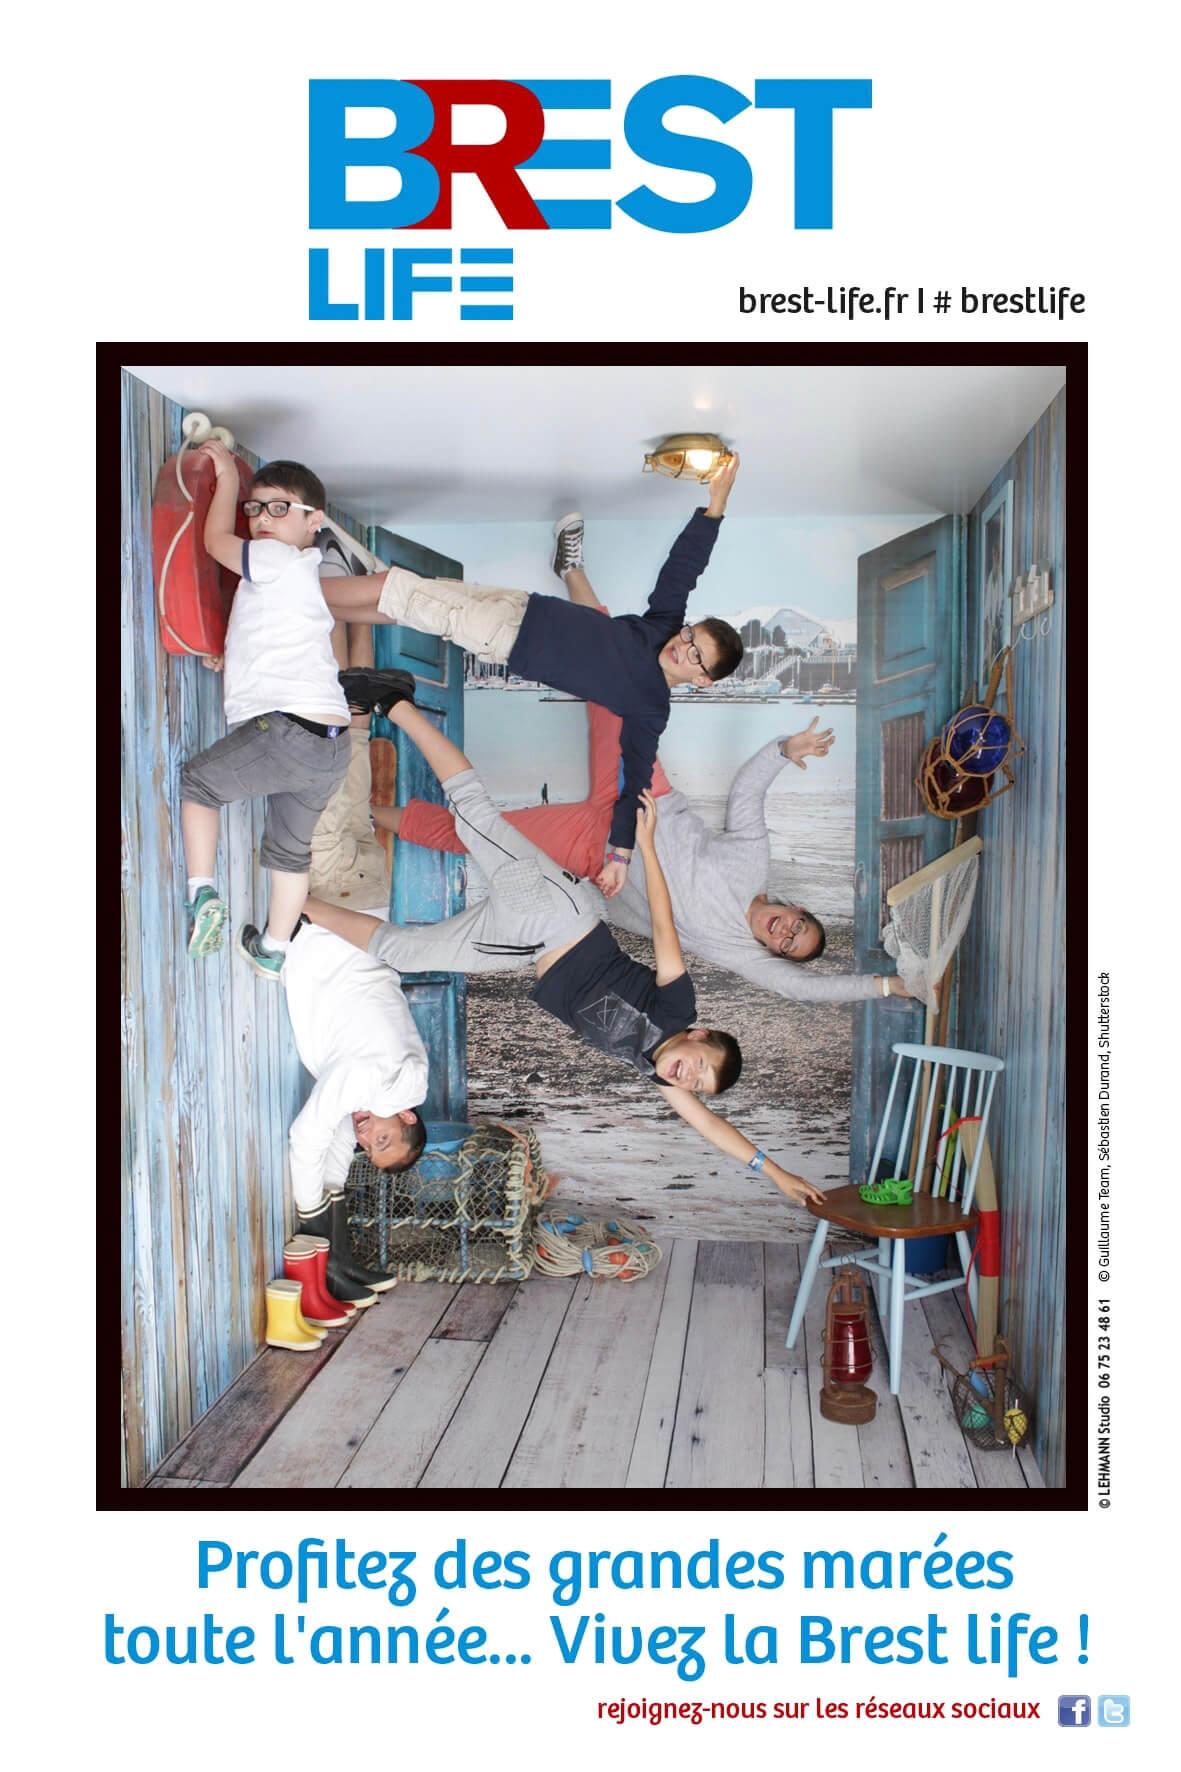 lehman-studio-photographe-angers-evenementiel-gravitybox-ambiance-cabane-de-plage-brest-life2